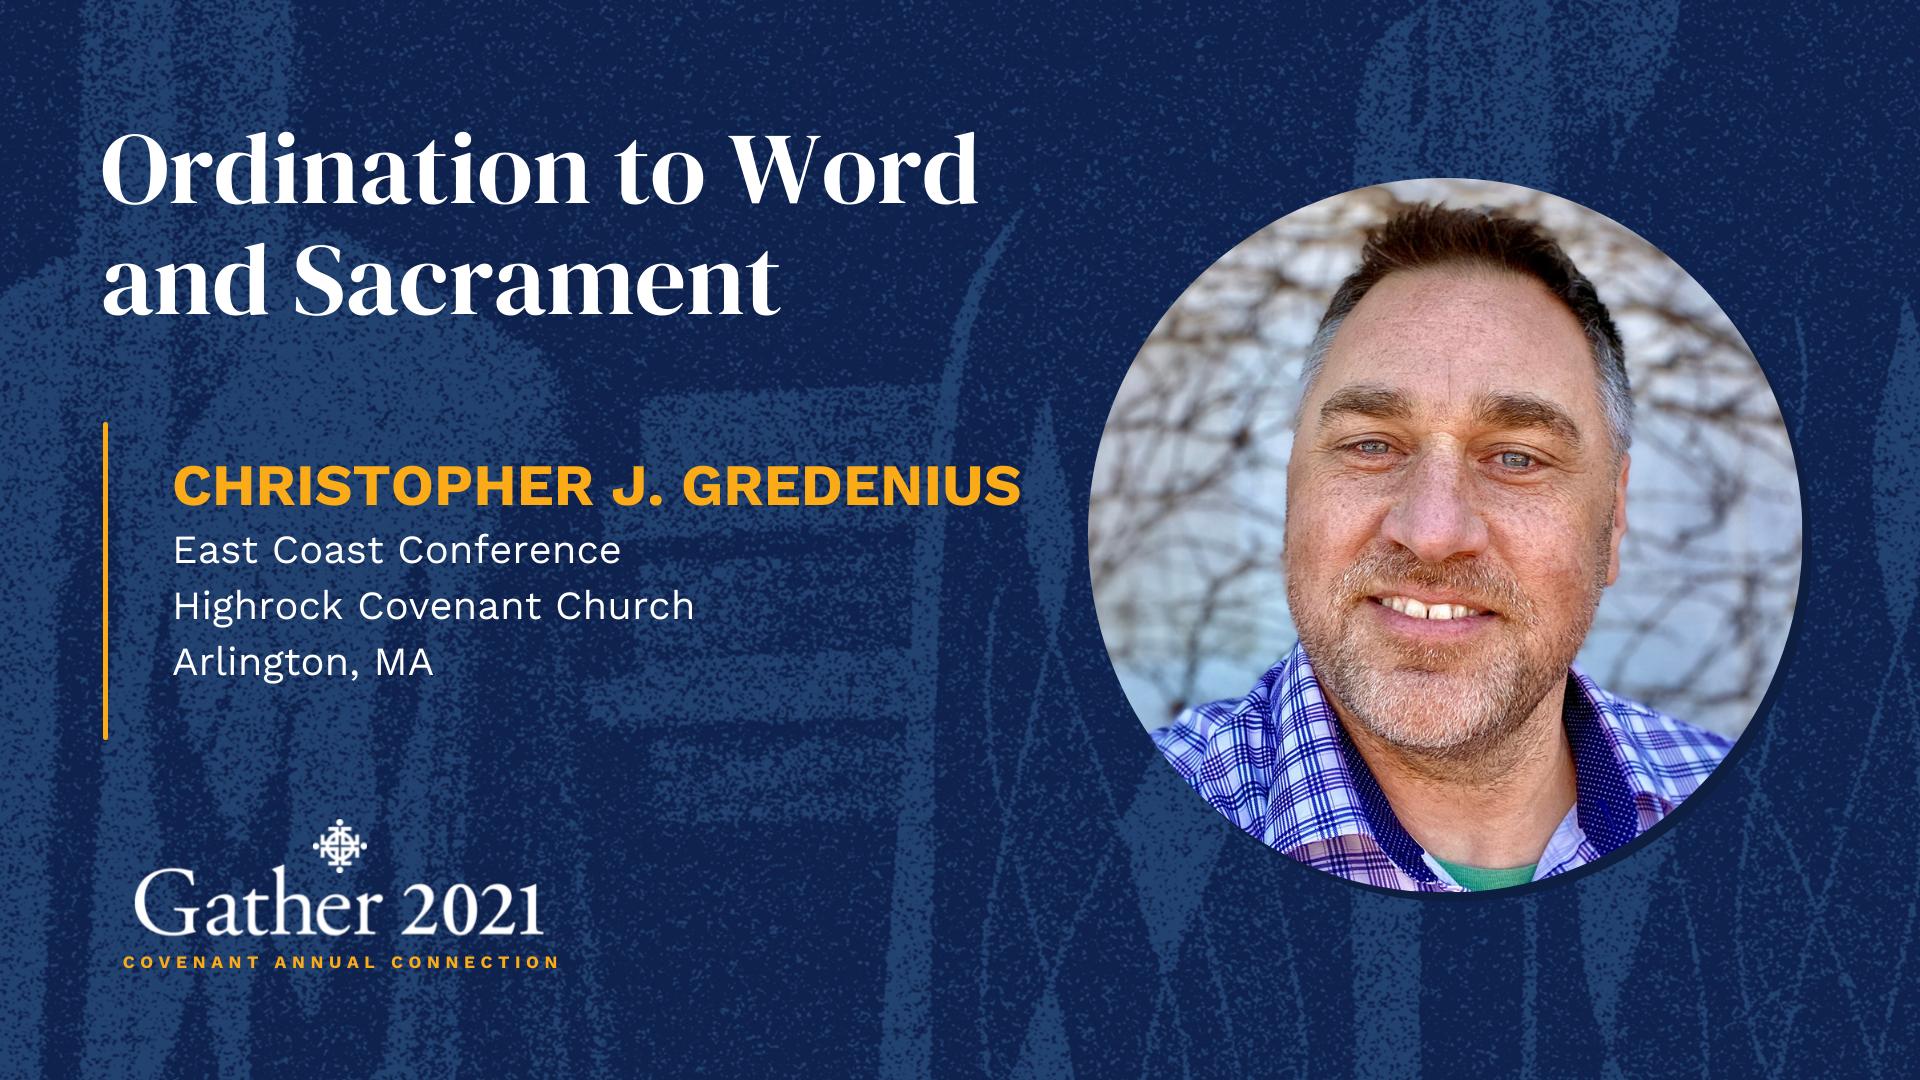 Christopher J. Gredenius